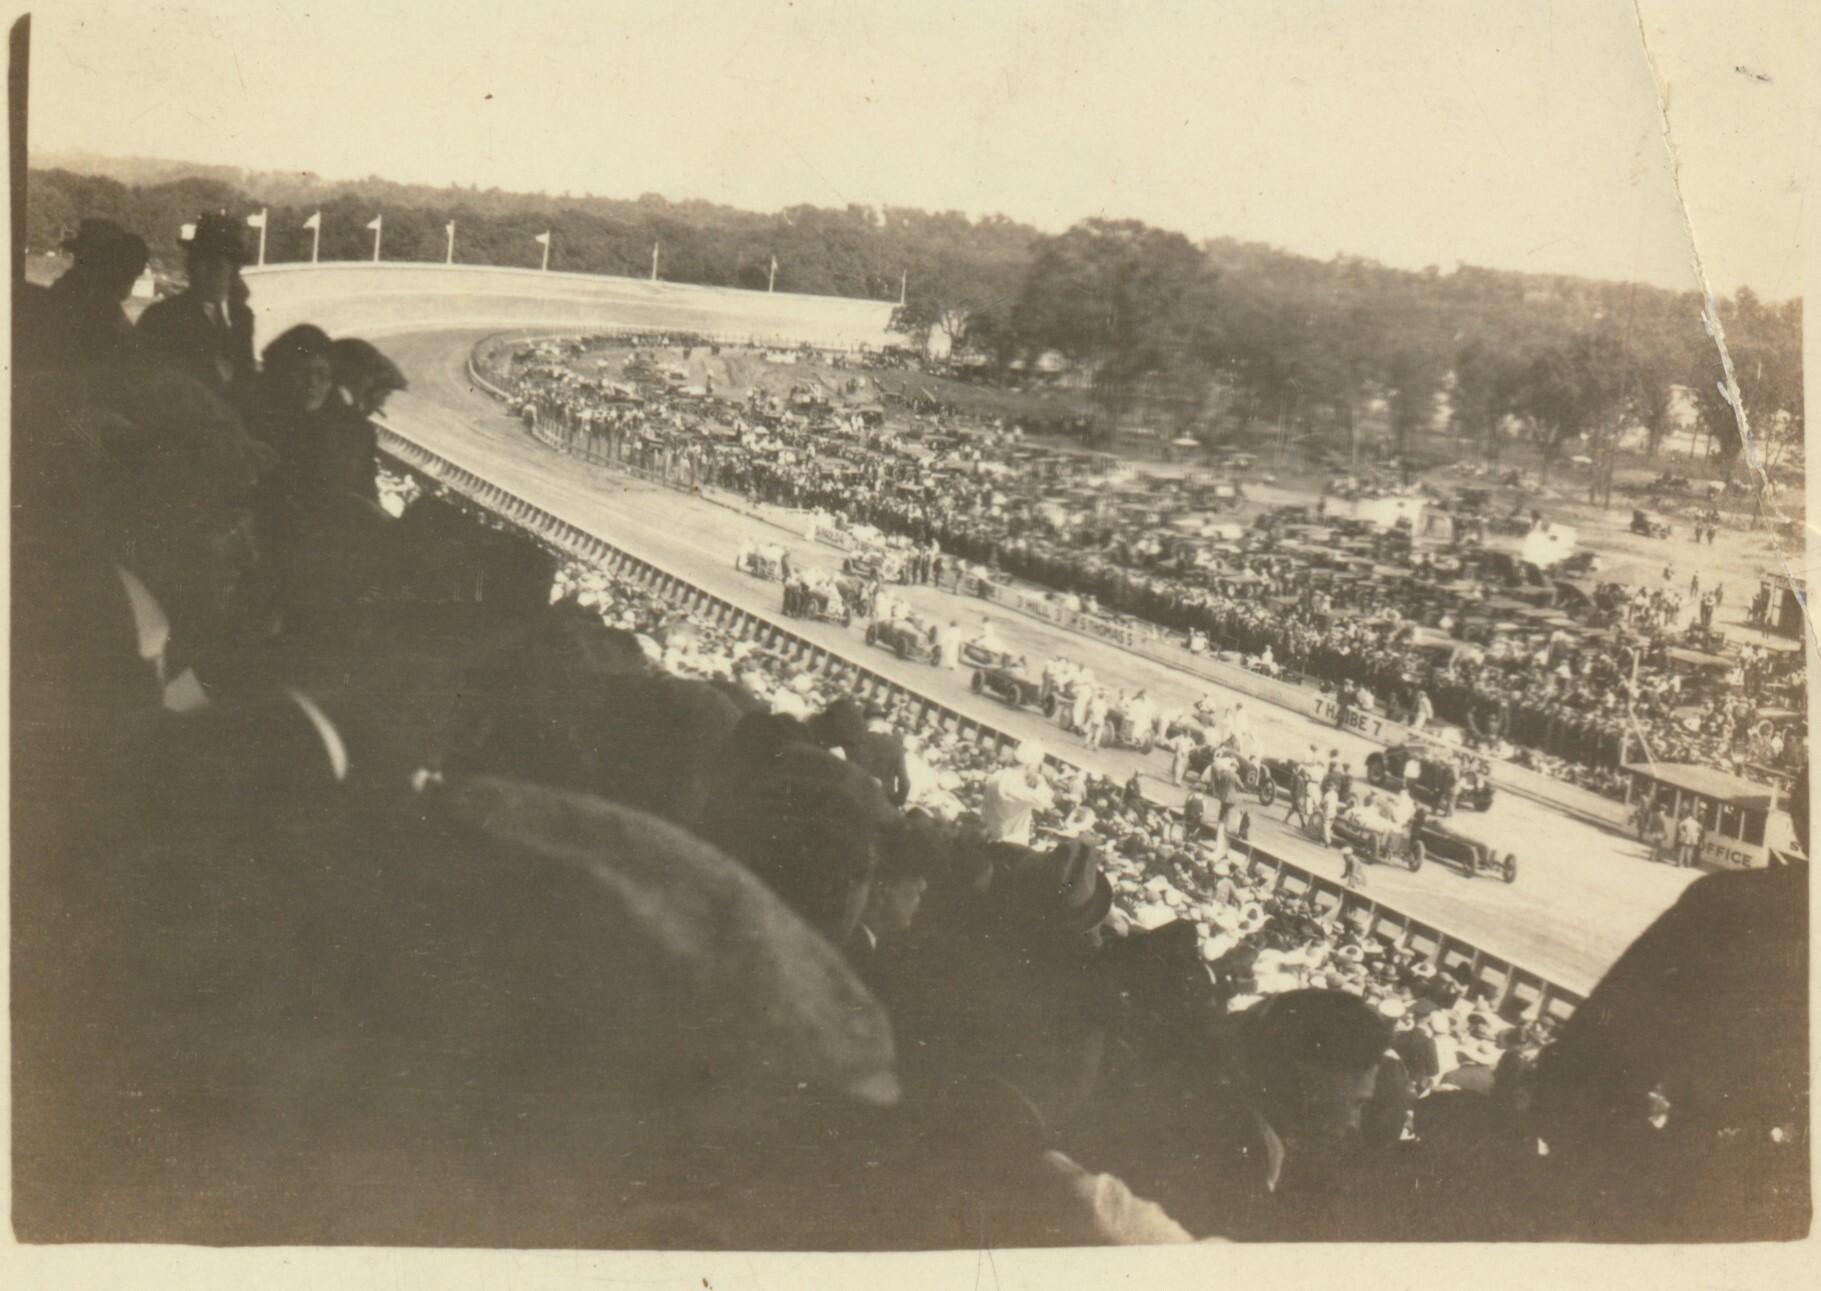 bannister complex racetrack 4